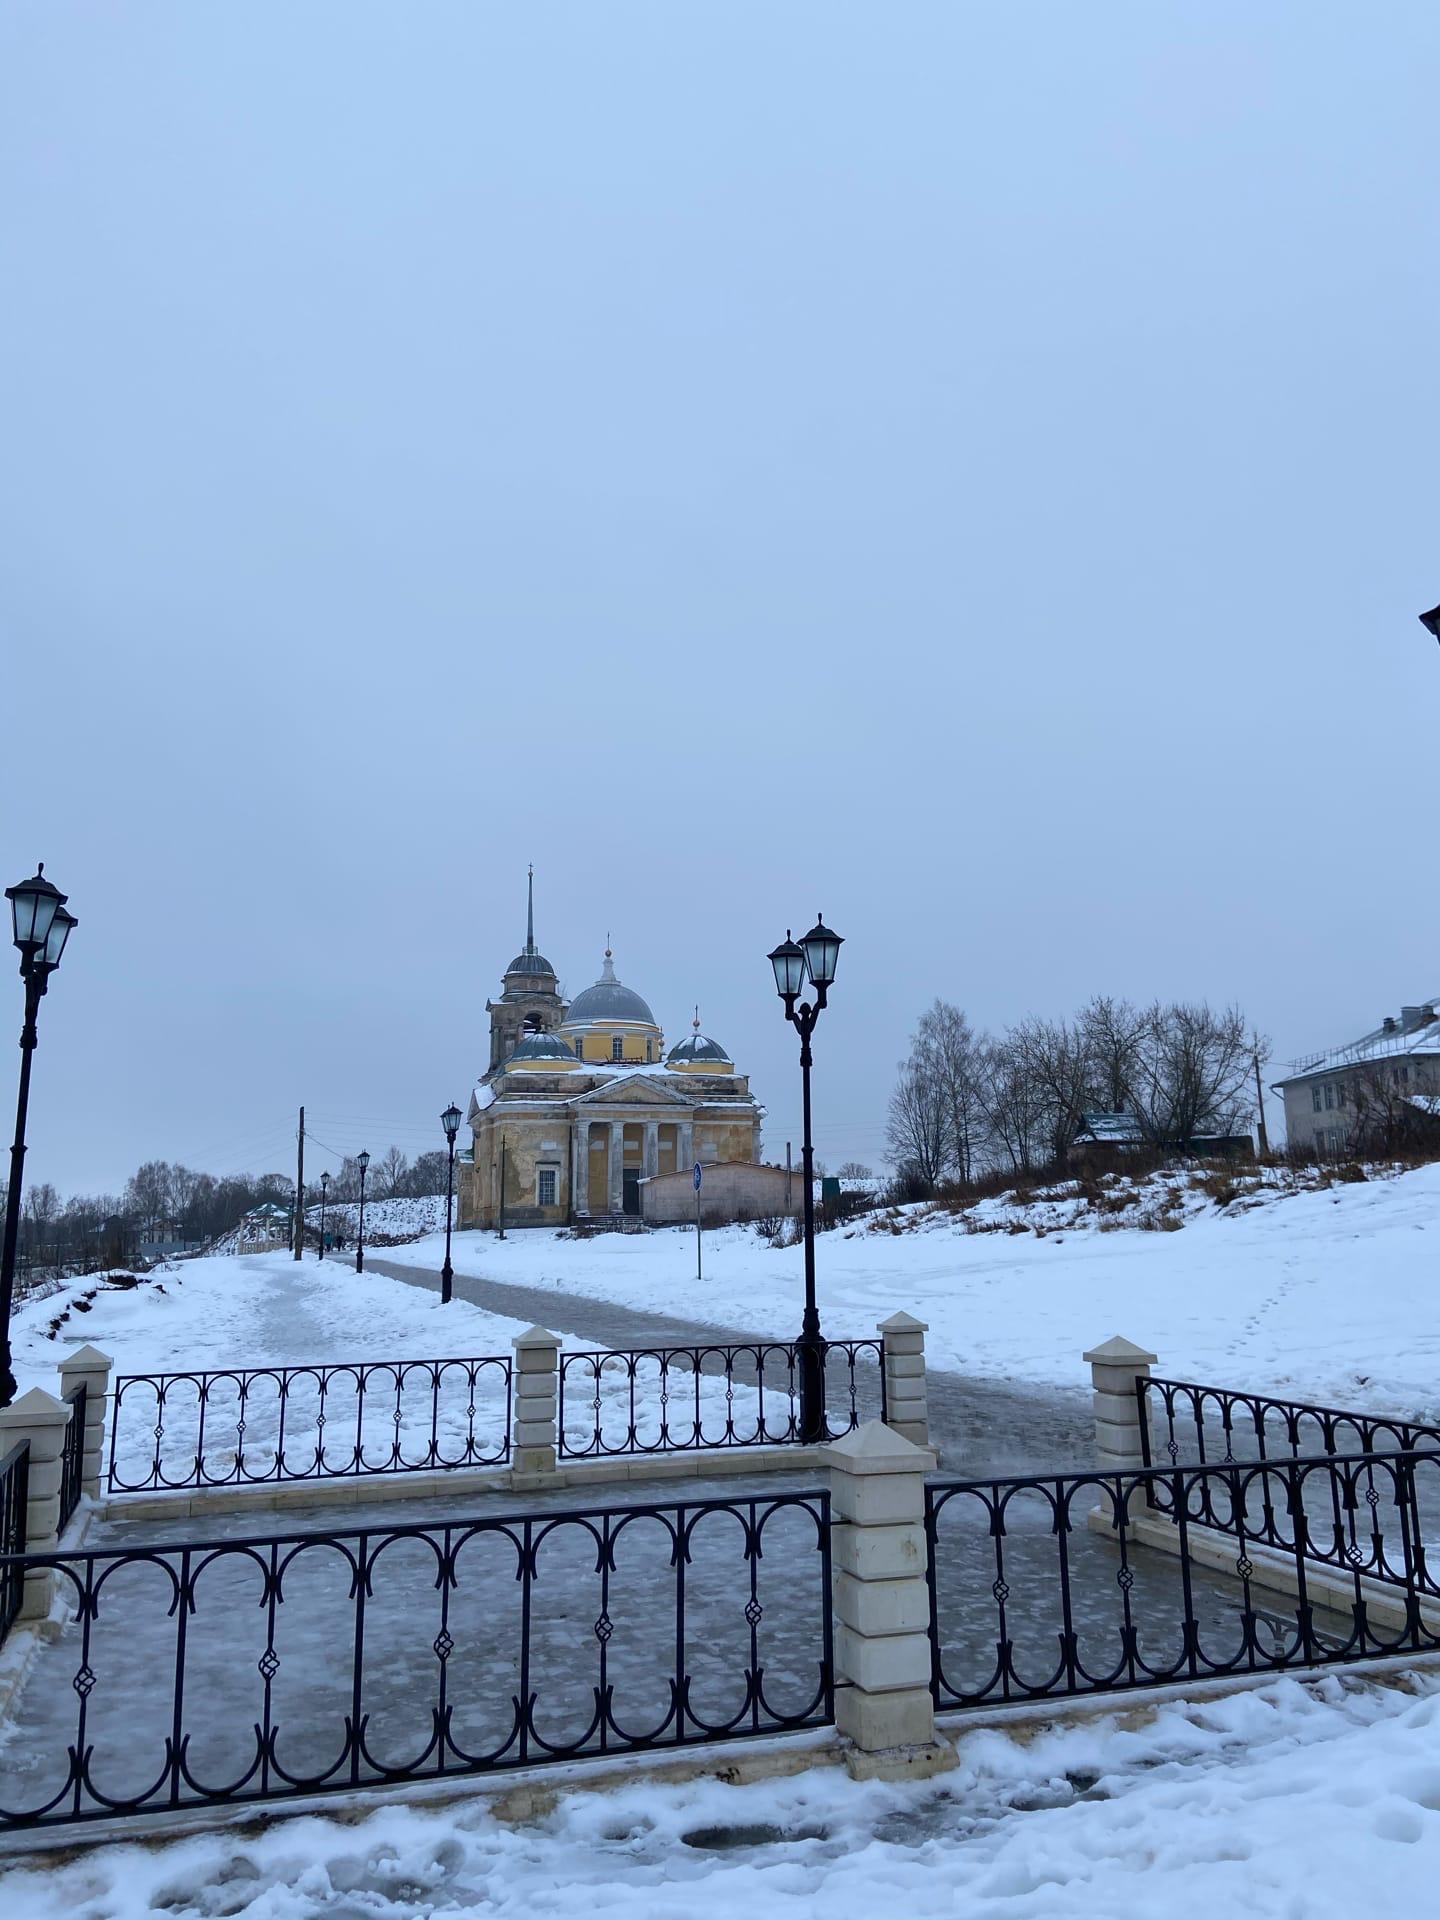 Тверской фотограф запечатлела зимнюю Старицу